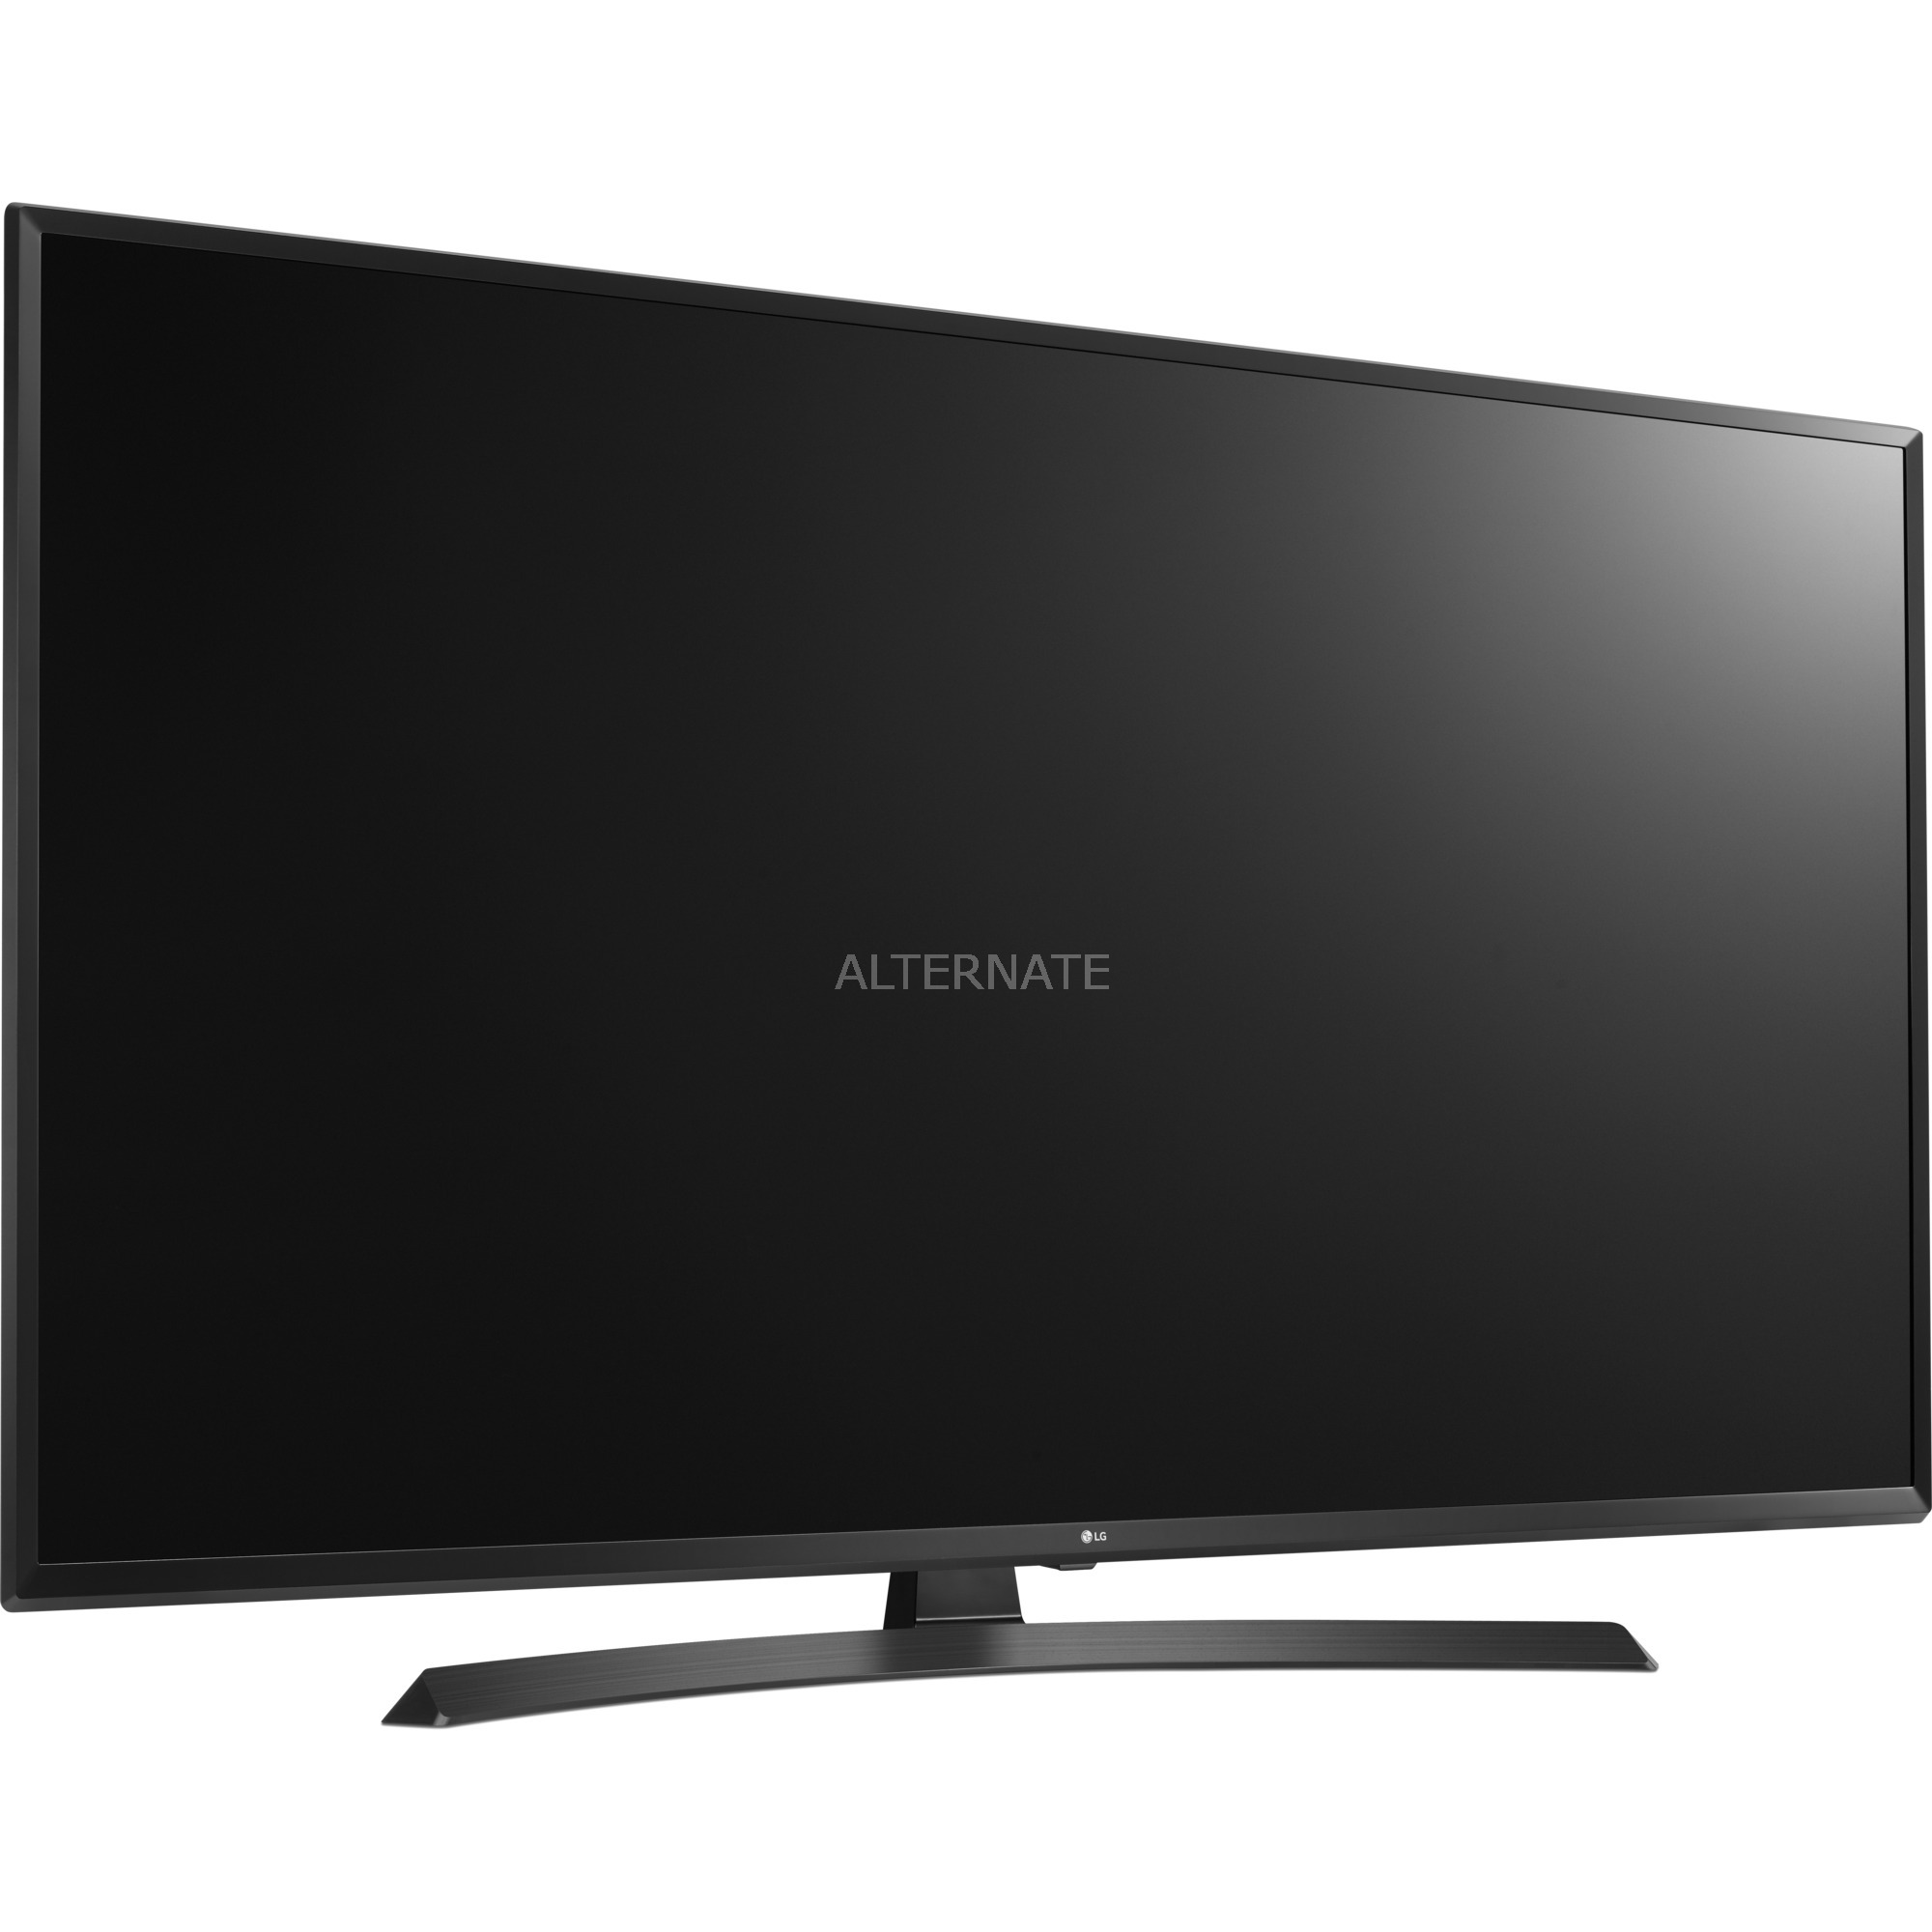 49UJ635V 49 4K Ultra HD Smart TV Wifi Noir écran LED, Téléviseur LED